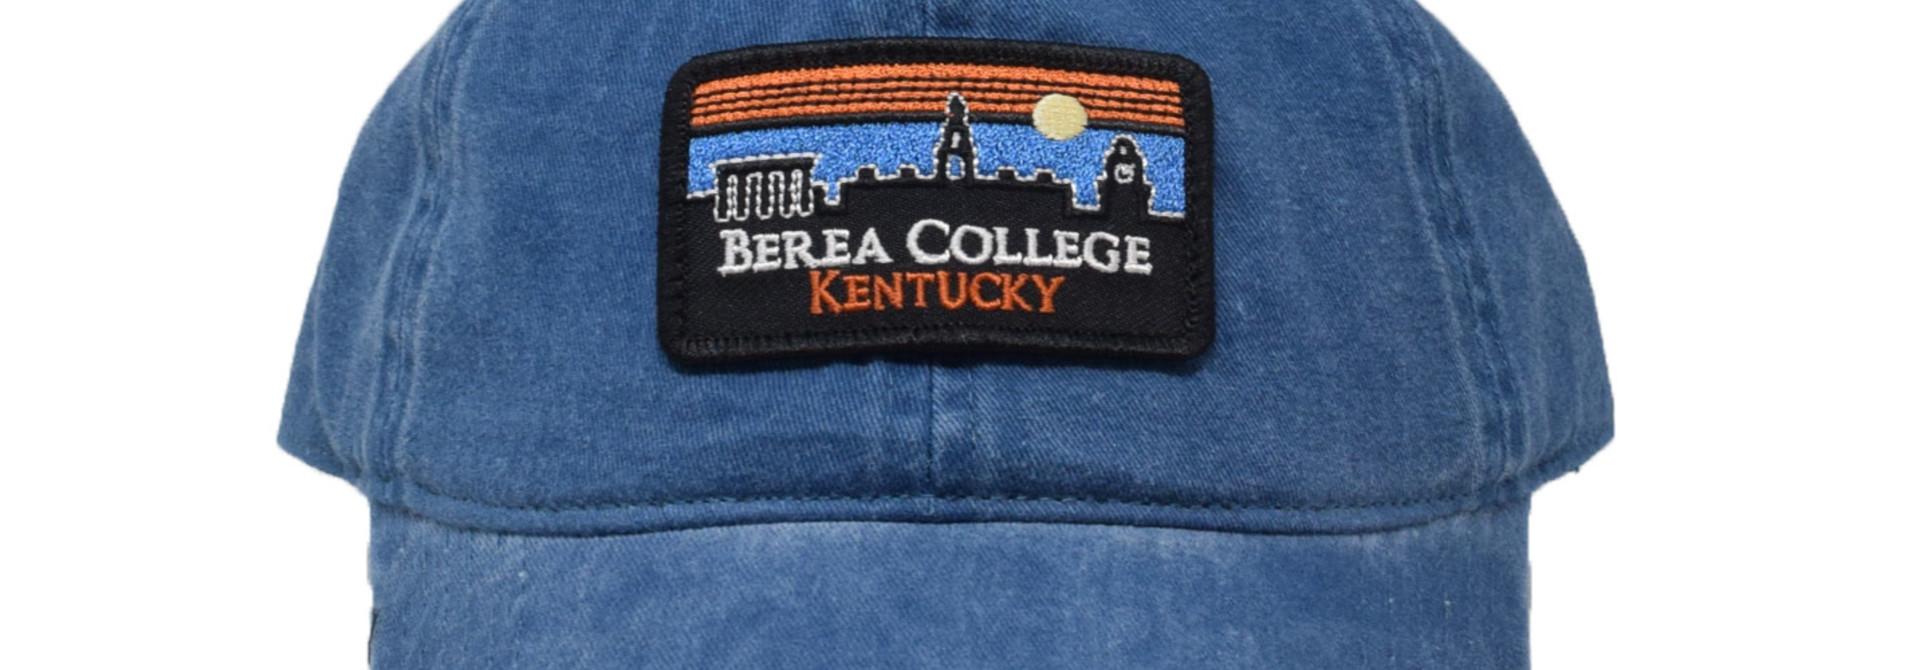 Berea College Retro Patch Vintage Ball Cap